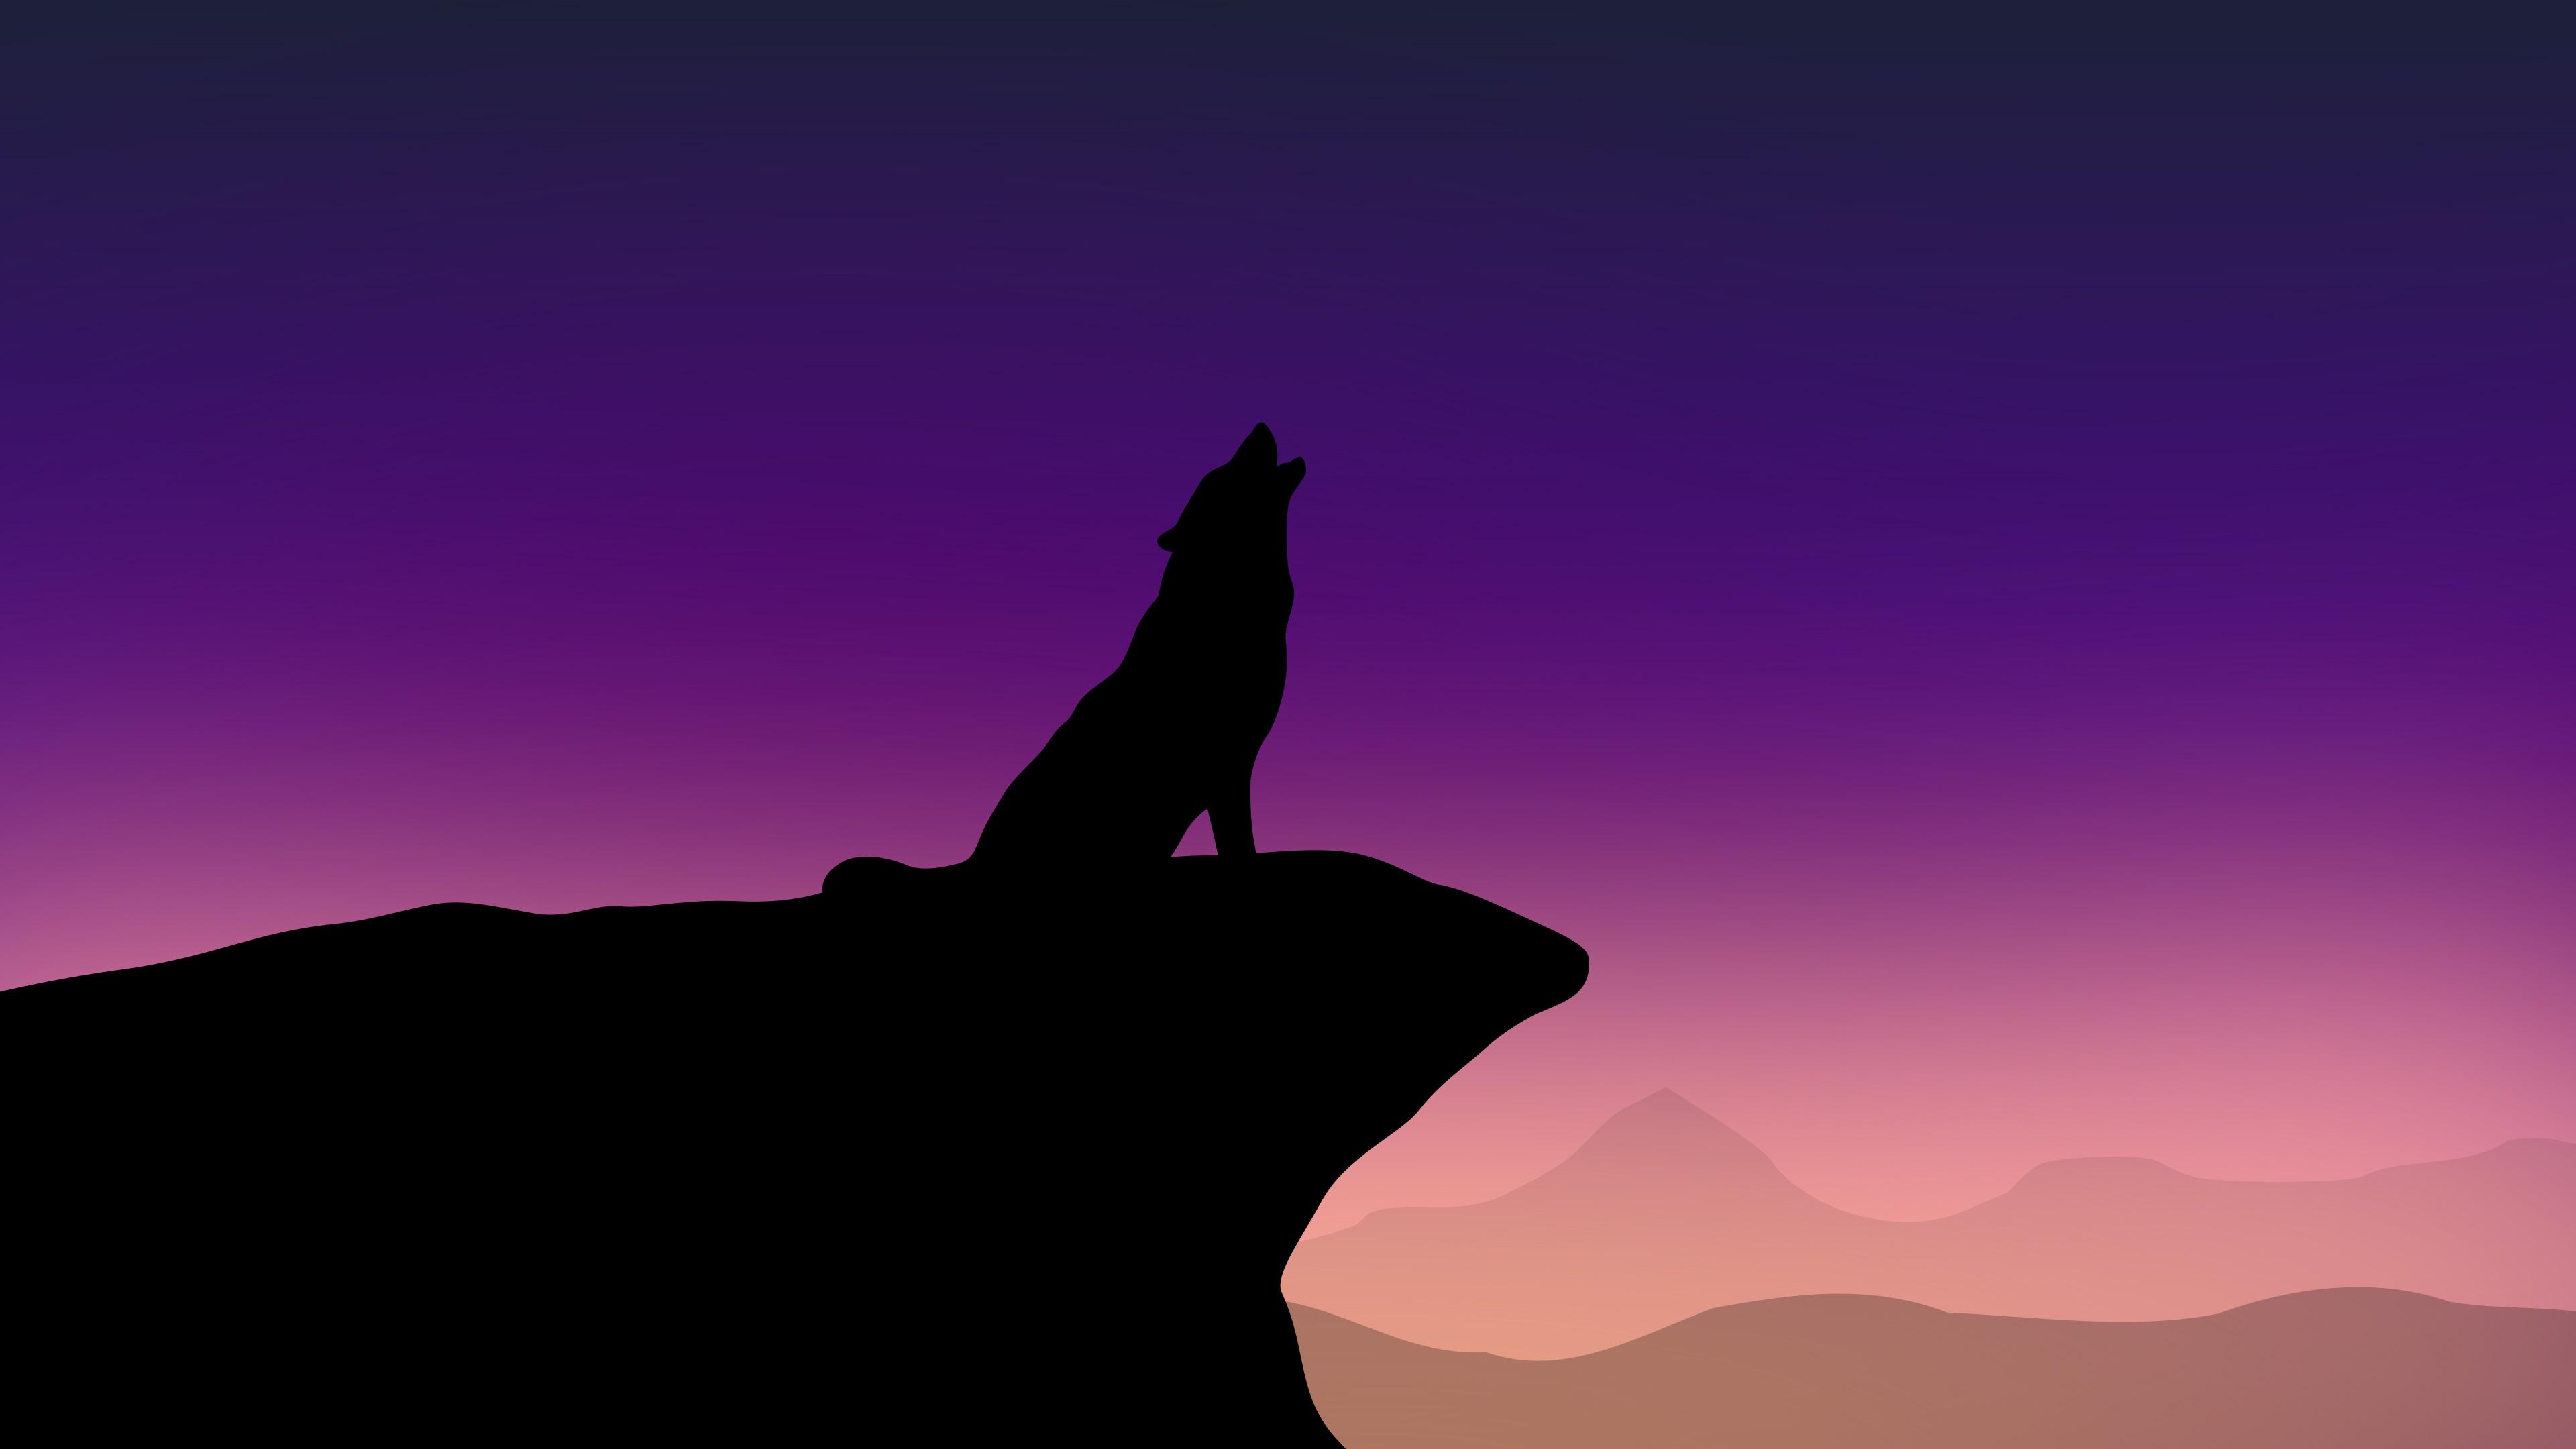 howling wolf minimalism 4k 1540755062 - Howling Wolf Minimalism 4k - wolf wallpapers, minimalist wallpapers, minimalism wallpapers, howling wallpapers, hd-wallpapers, digital art wallpapers, deviantart wallpapers, artwork wallpapers, artist wallpapers, 4k-wallpapers